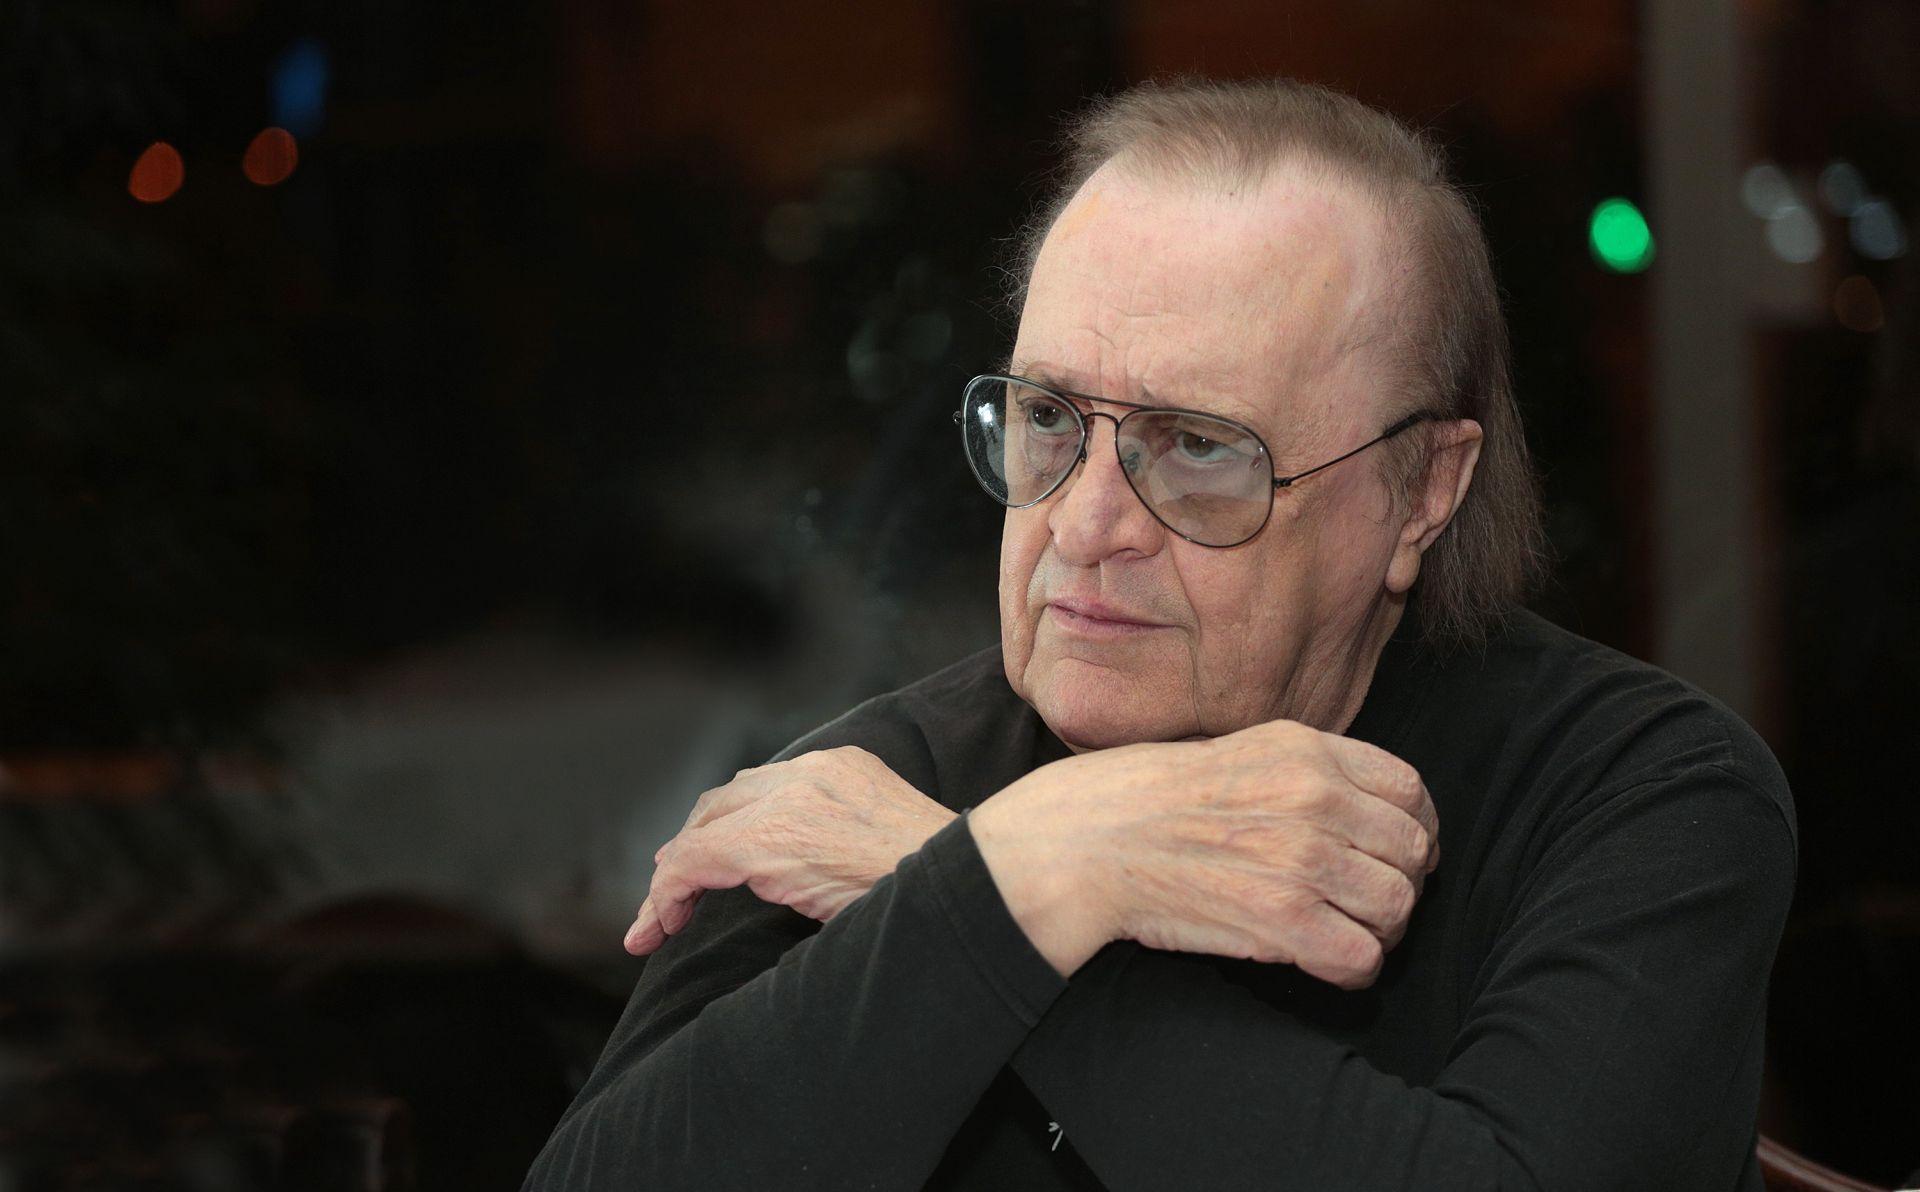 Arsen će u Srbiji ostati upamćen kao romantik, šansonijer Balkana osebujnog stila